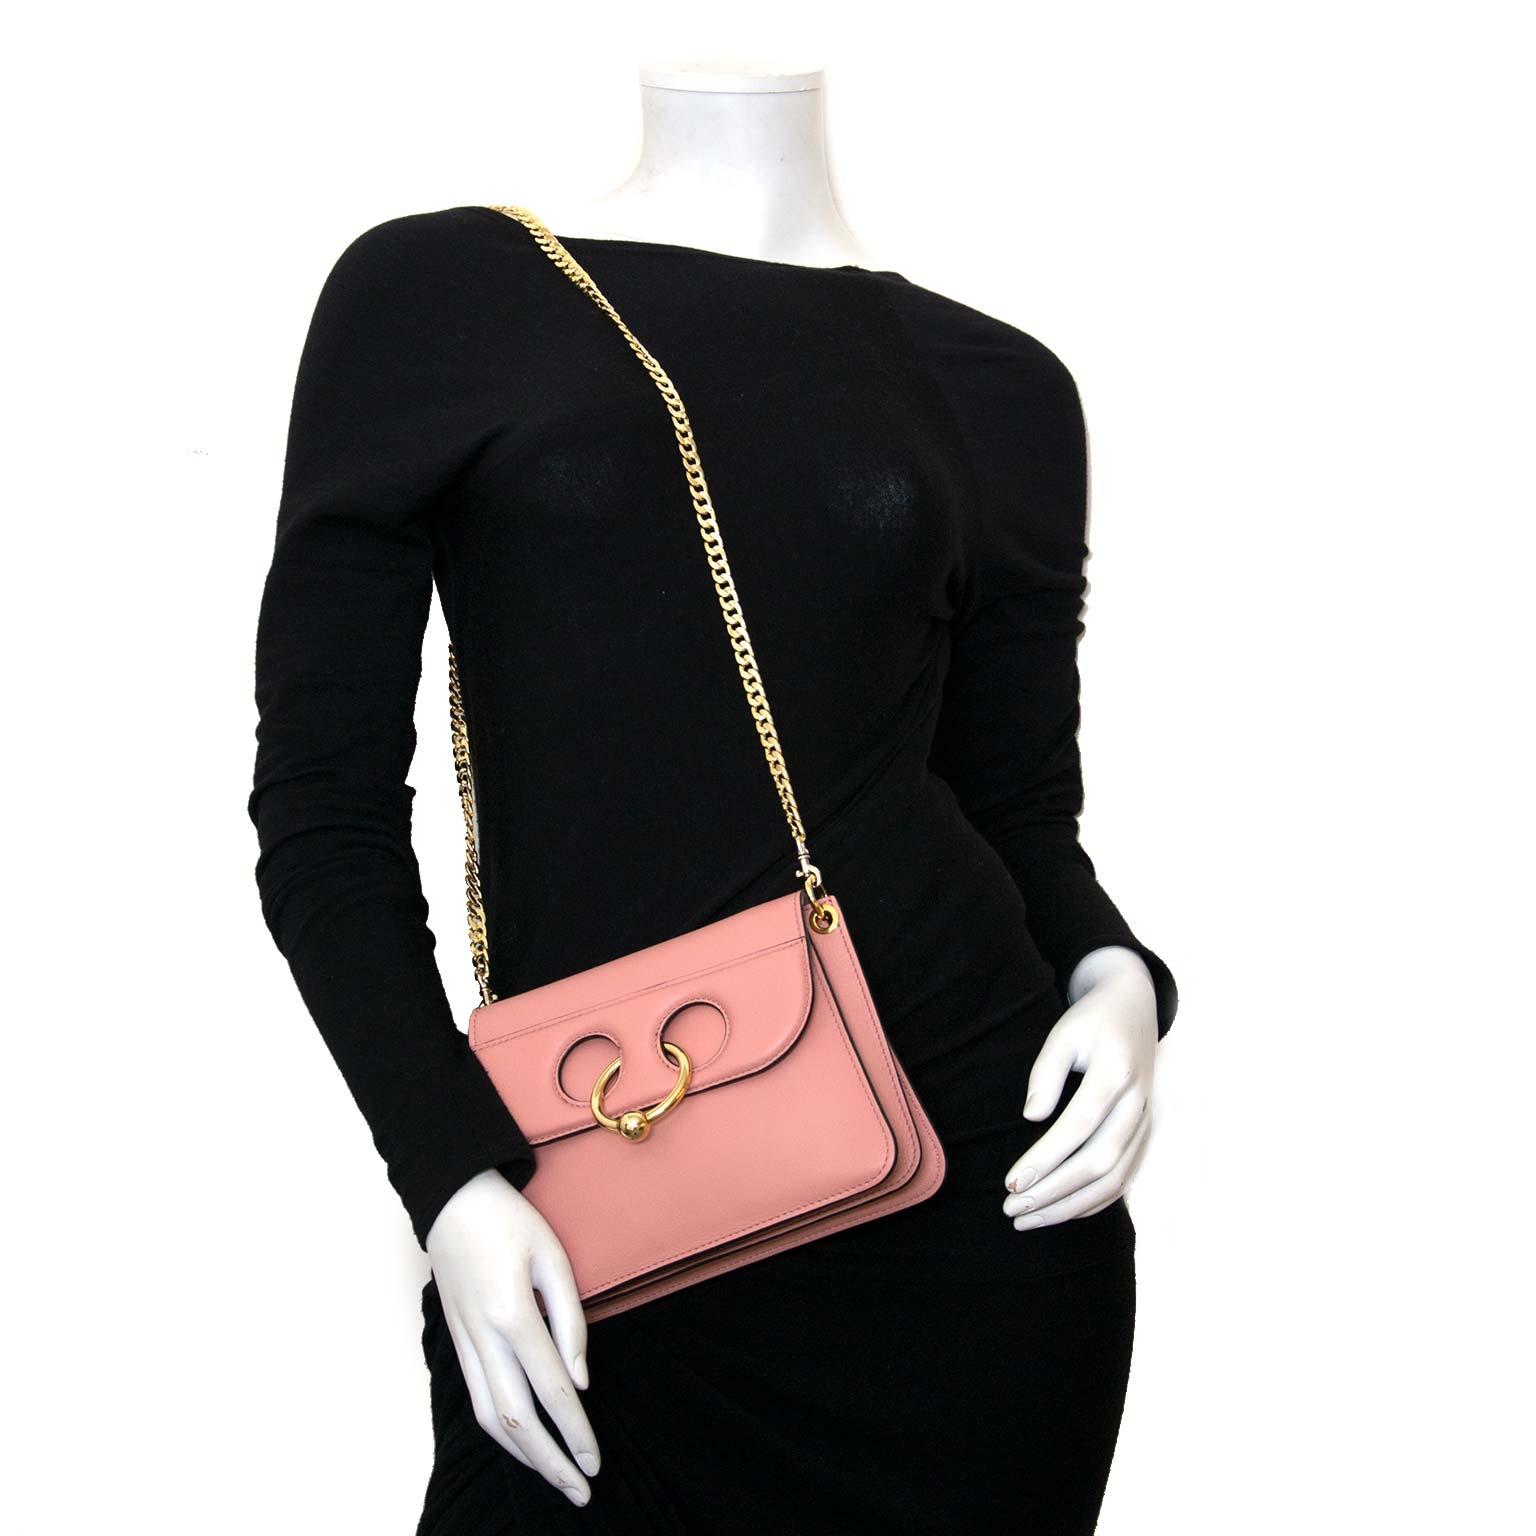 JW Anderson mini pierce tas dusty roos nu online bij labellov vintage mode webshop belgië